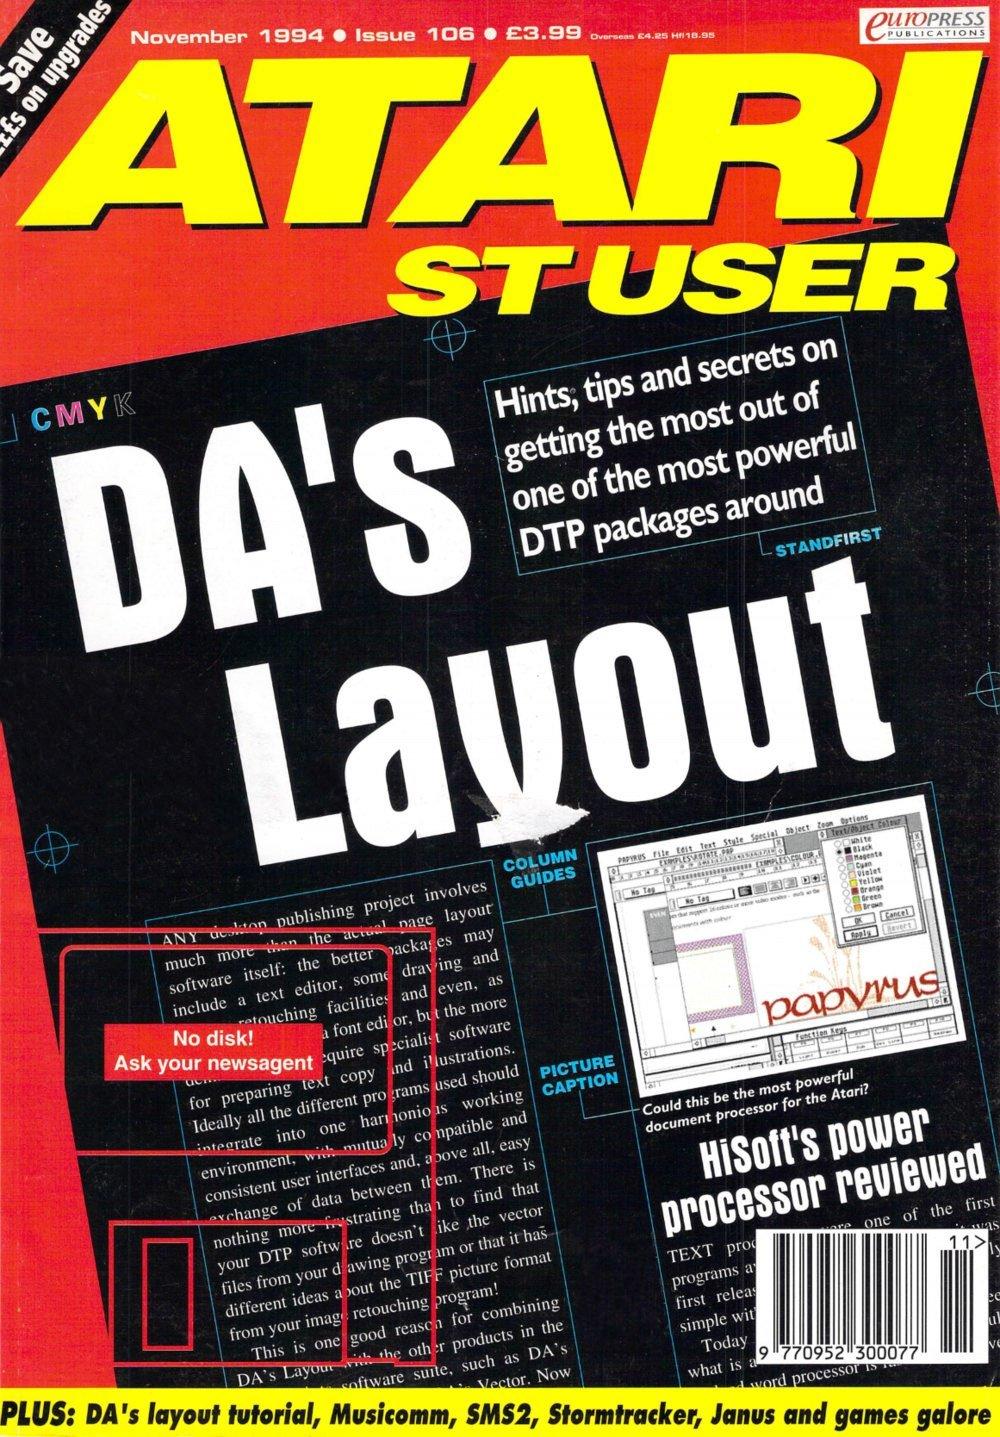 Atari ST User Issue 106 (November 1994)